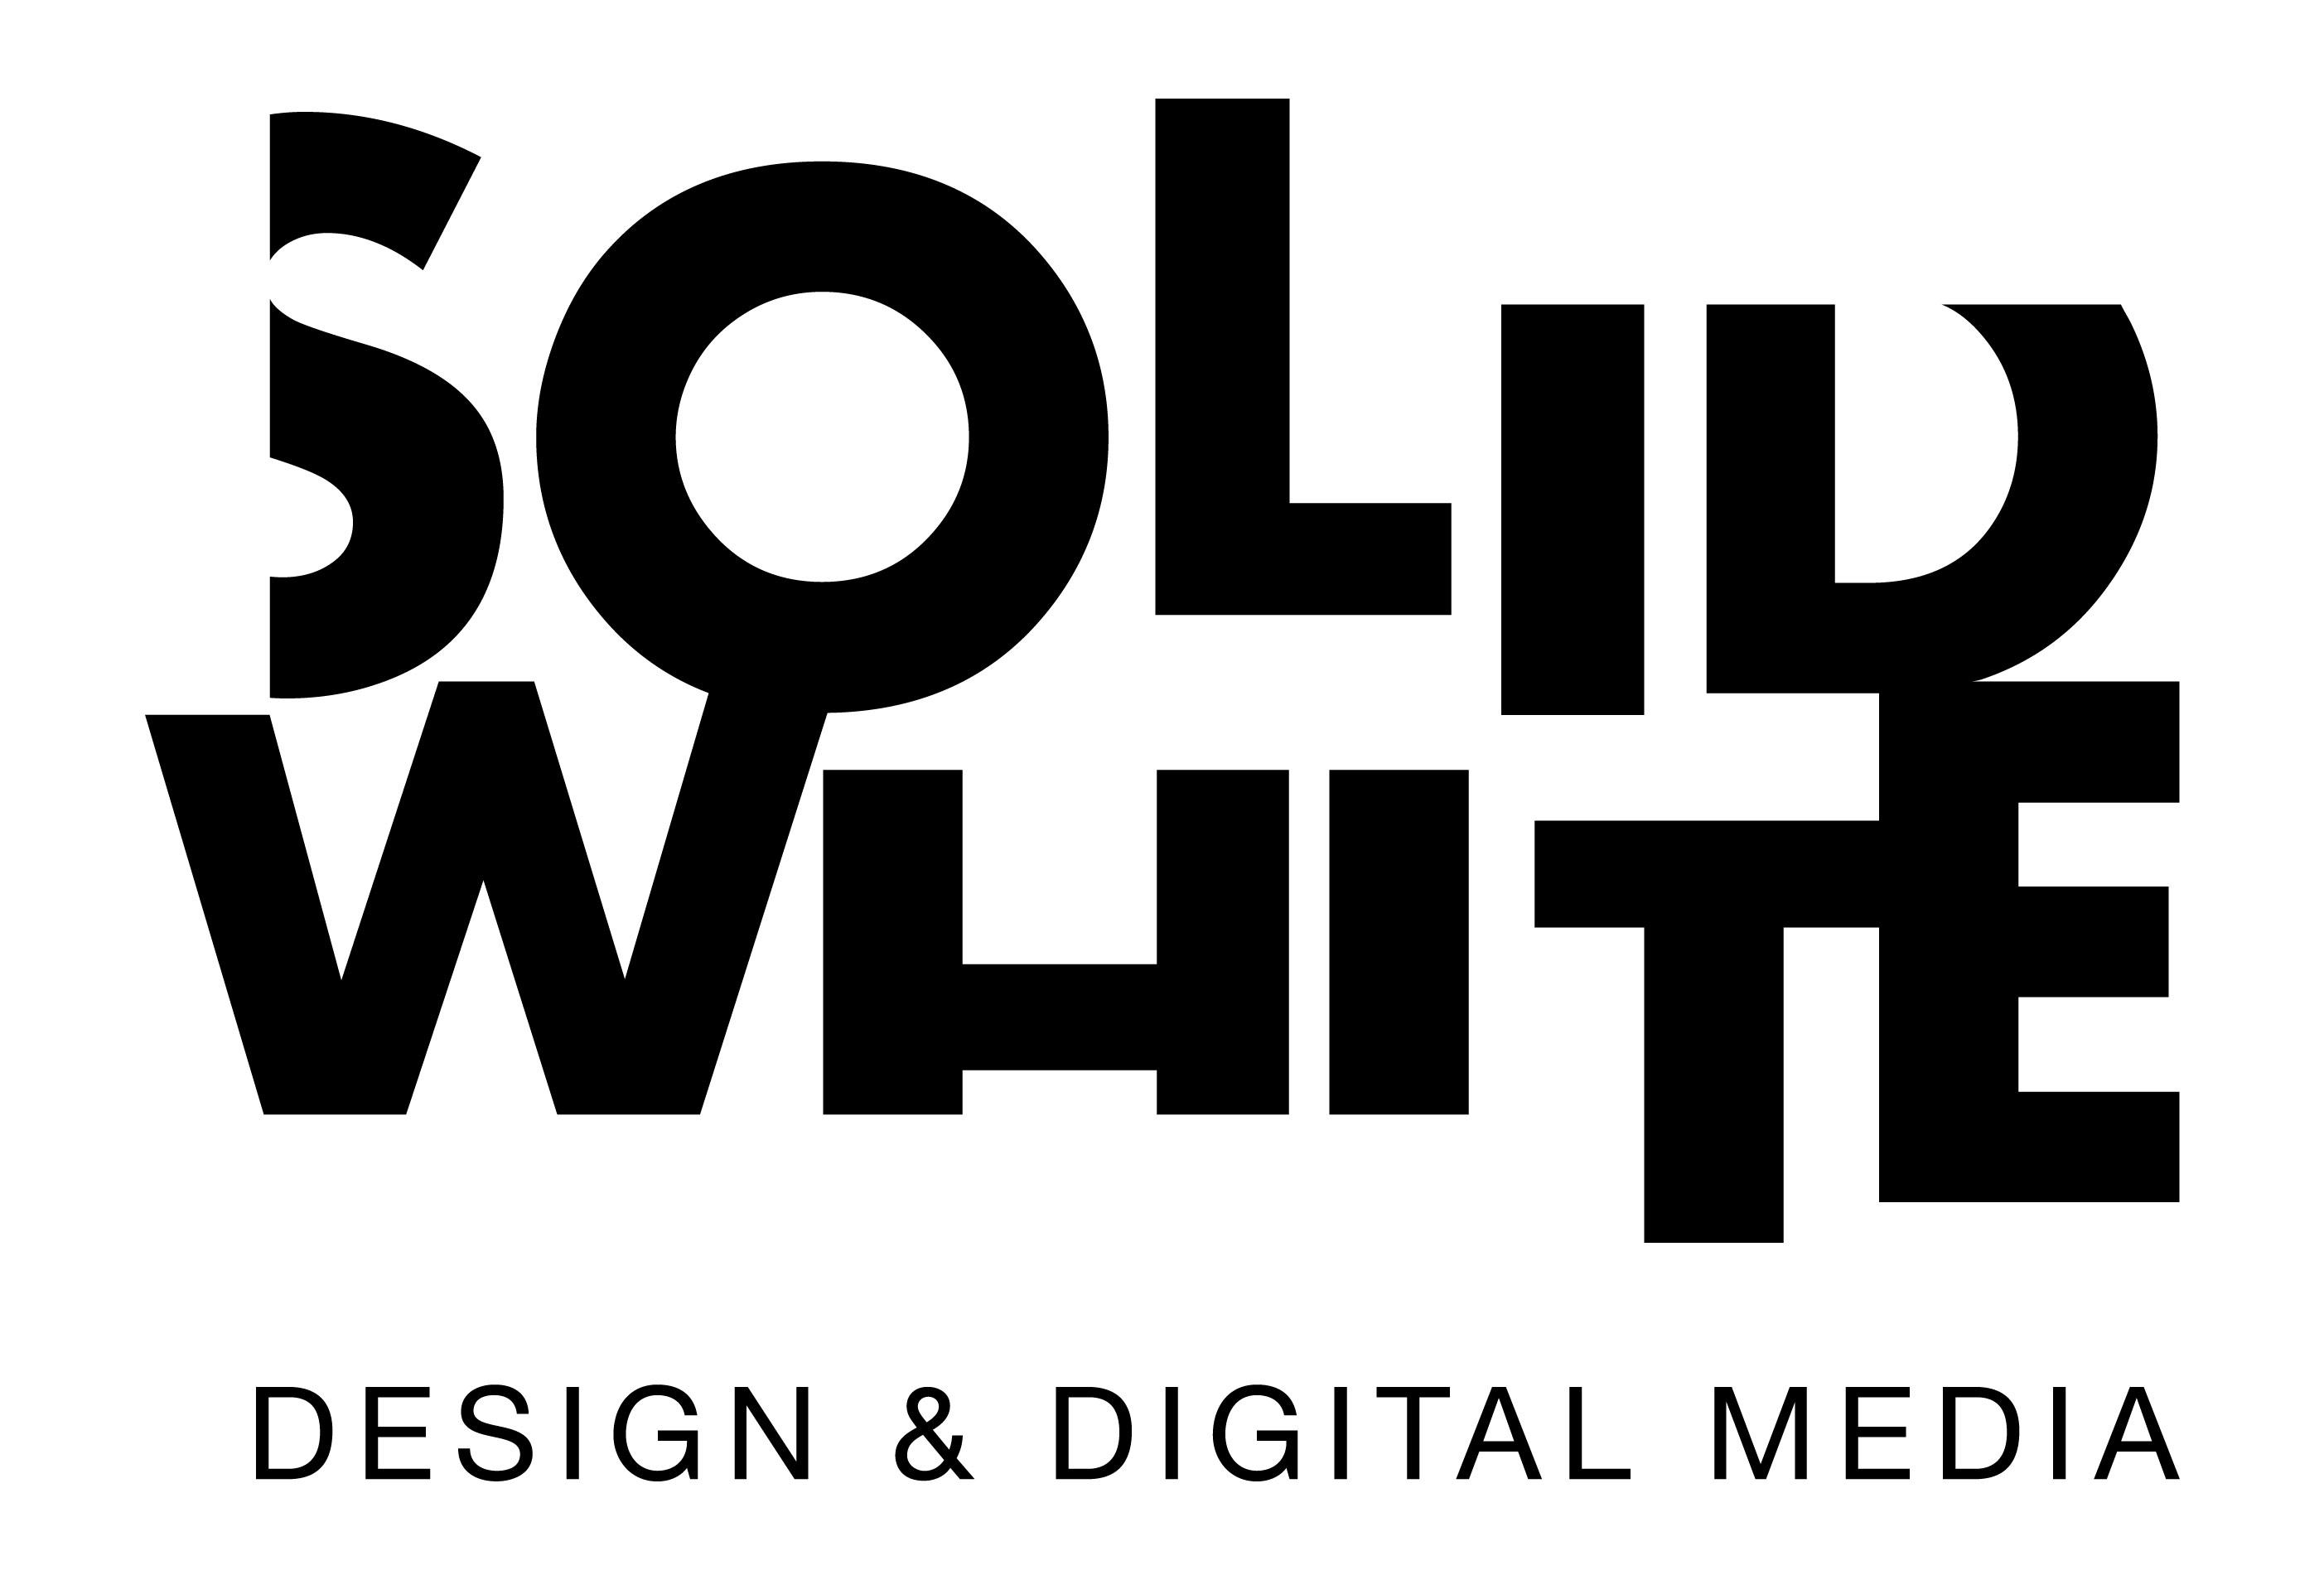 SOLID WHITE design & digital media